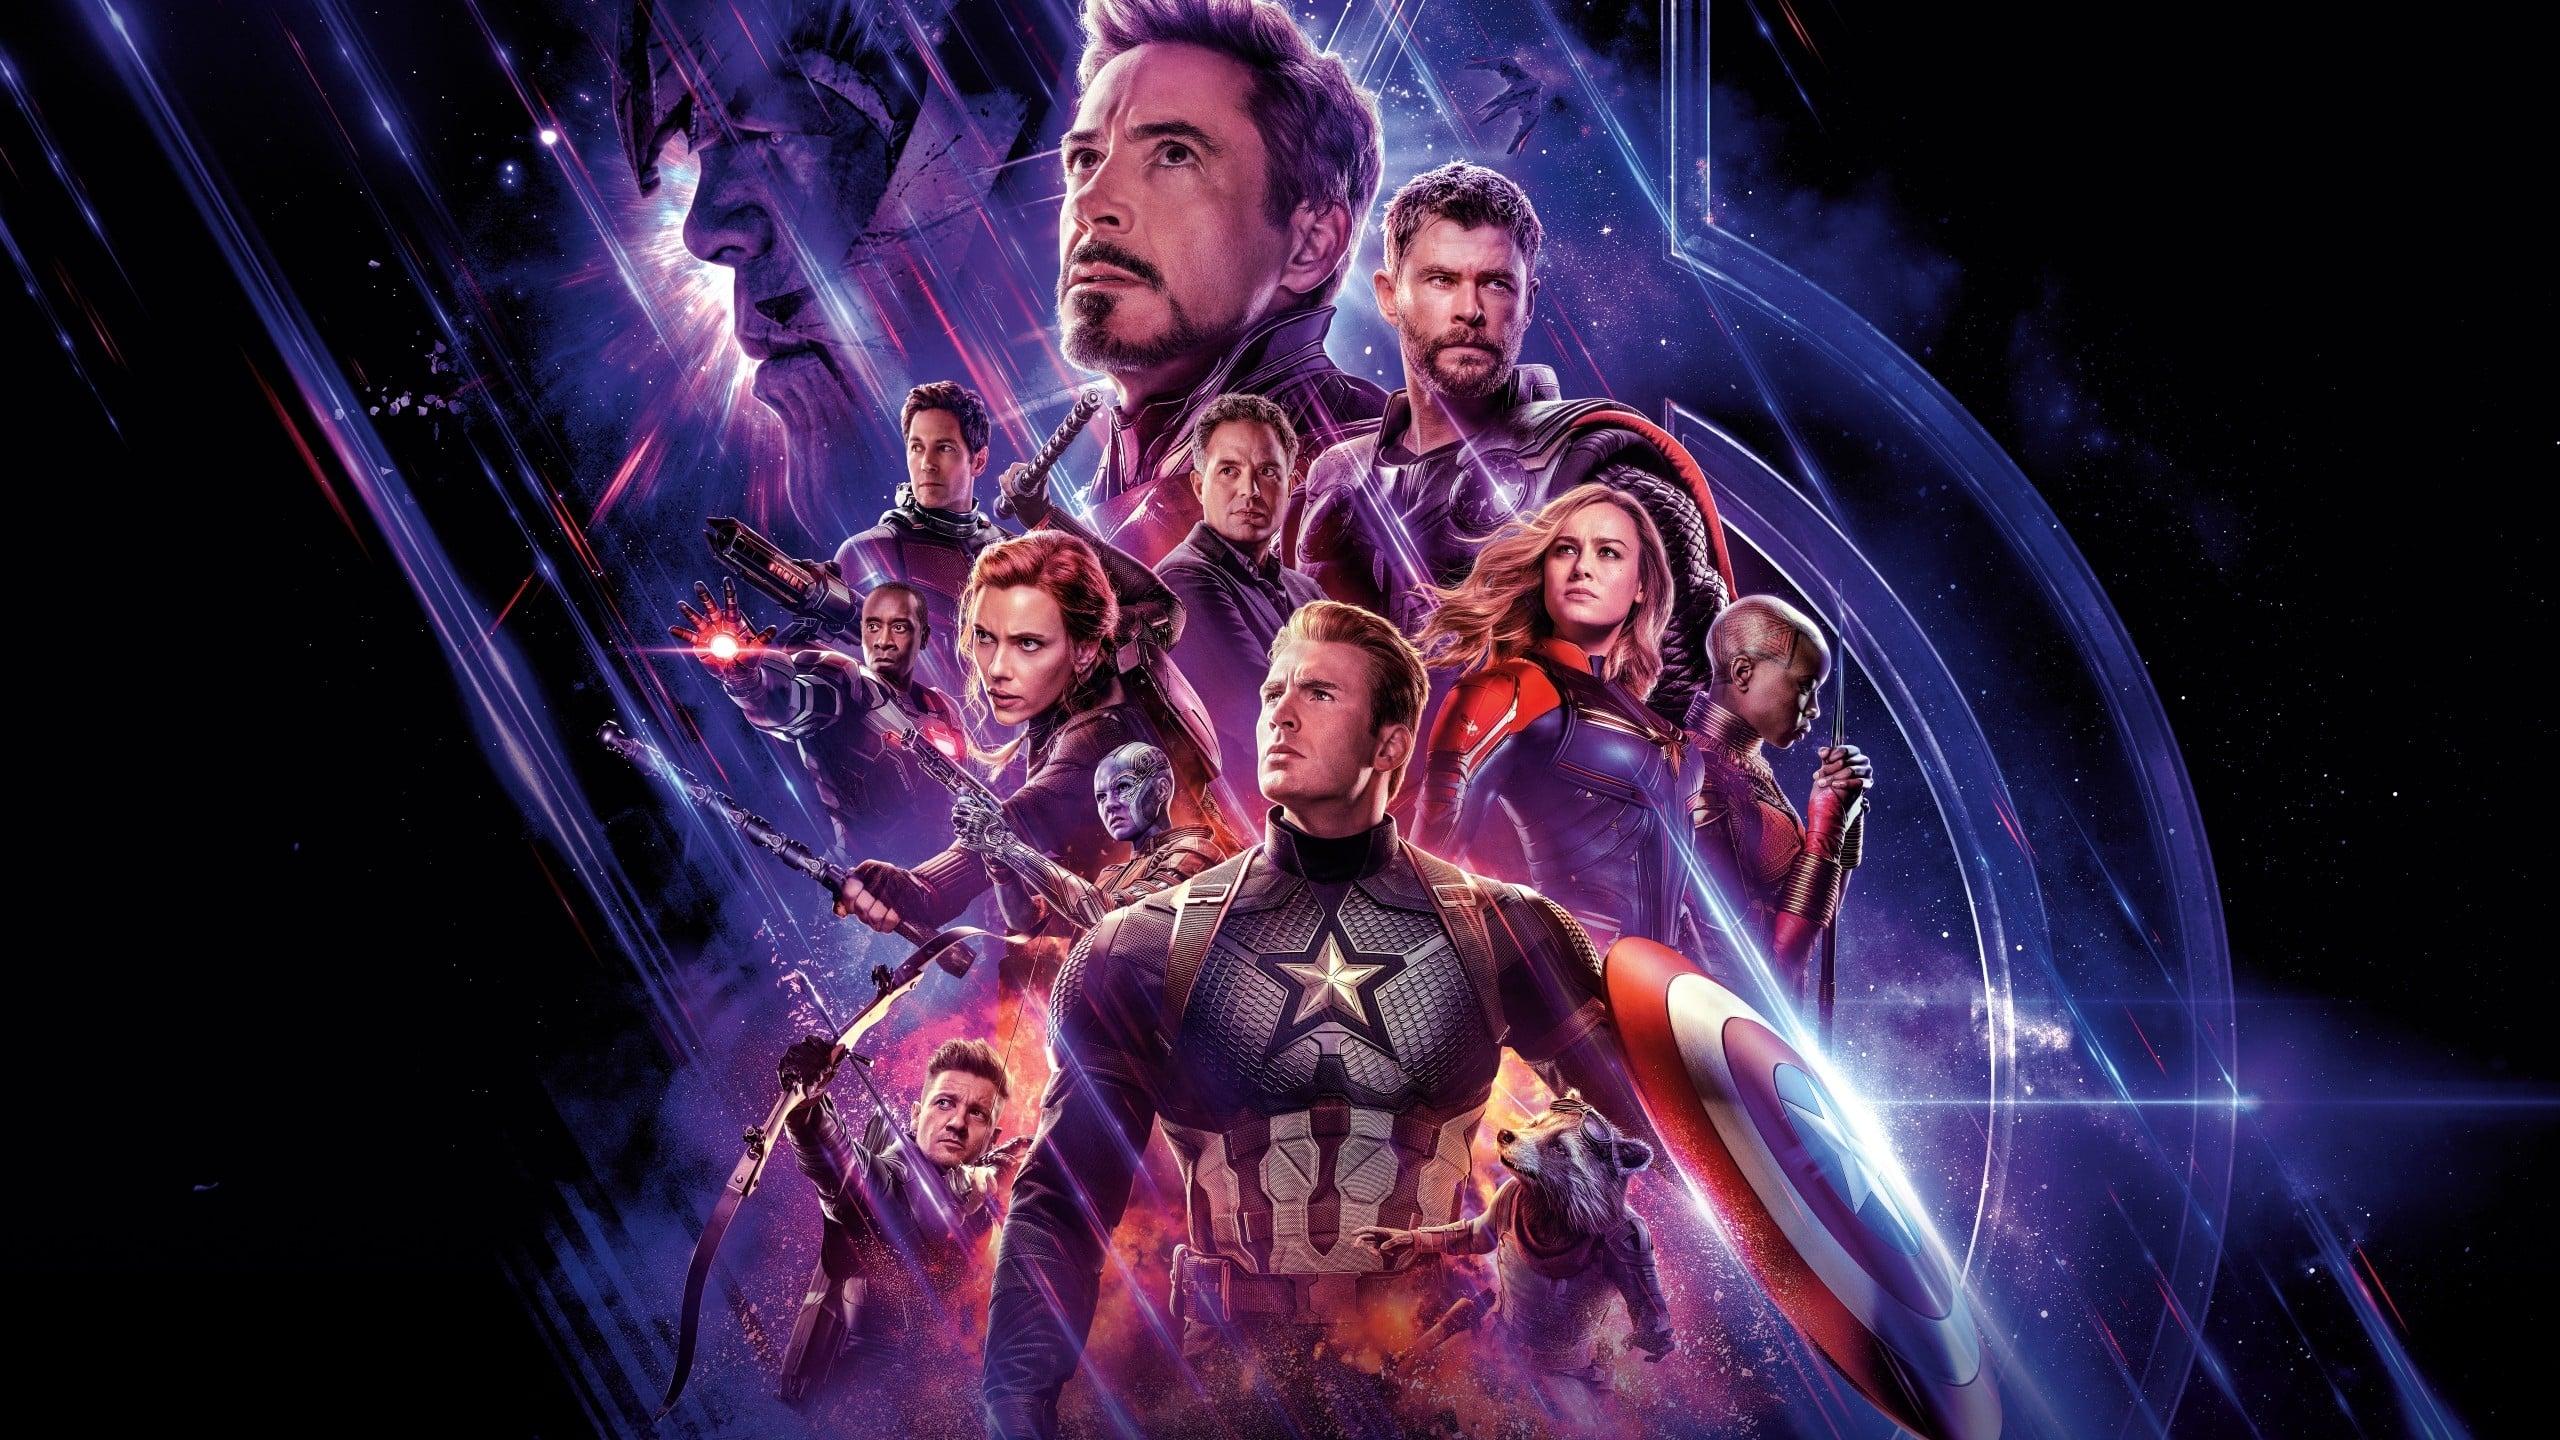 Avengers Endgame 2019 Hdcamrip Full Movie Watch Online English